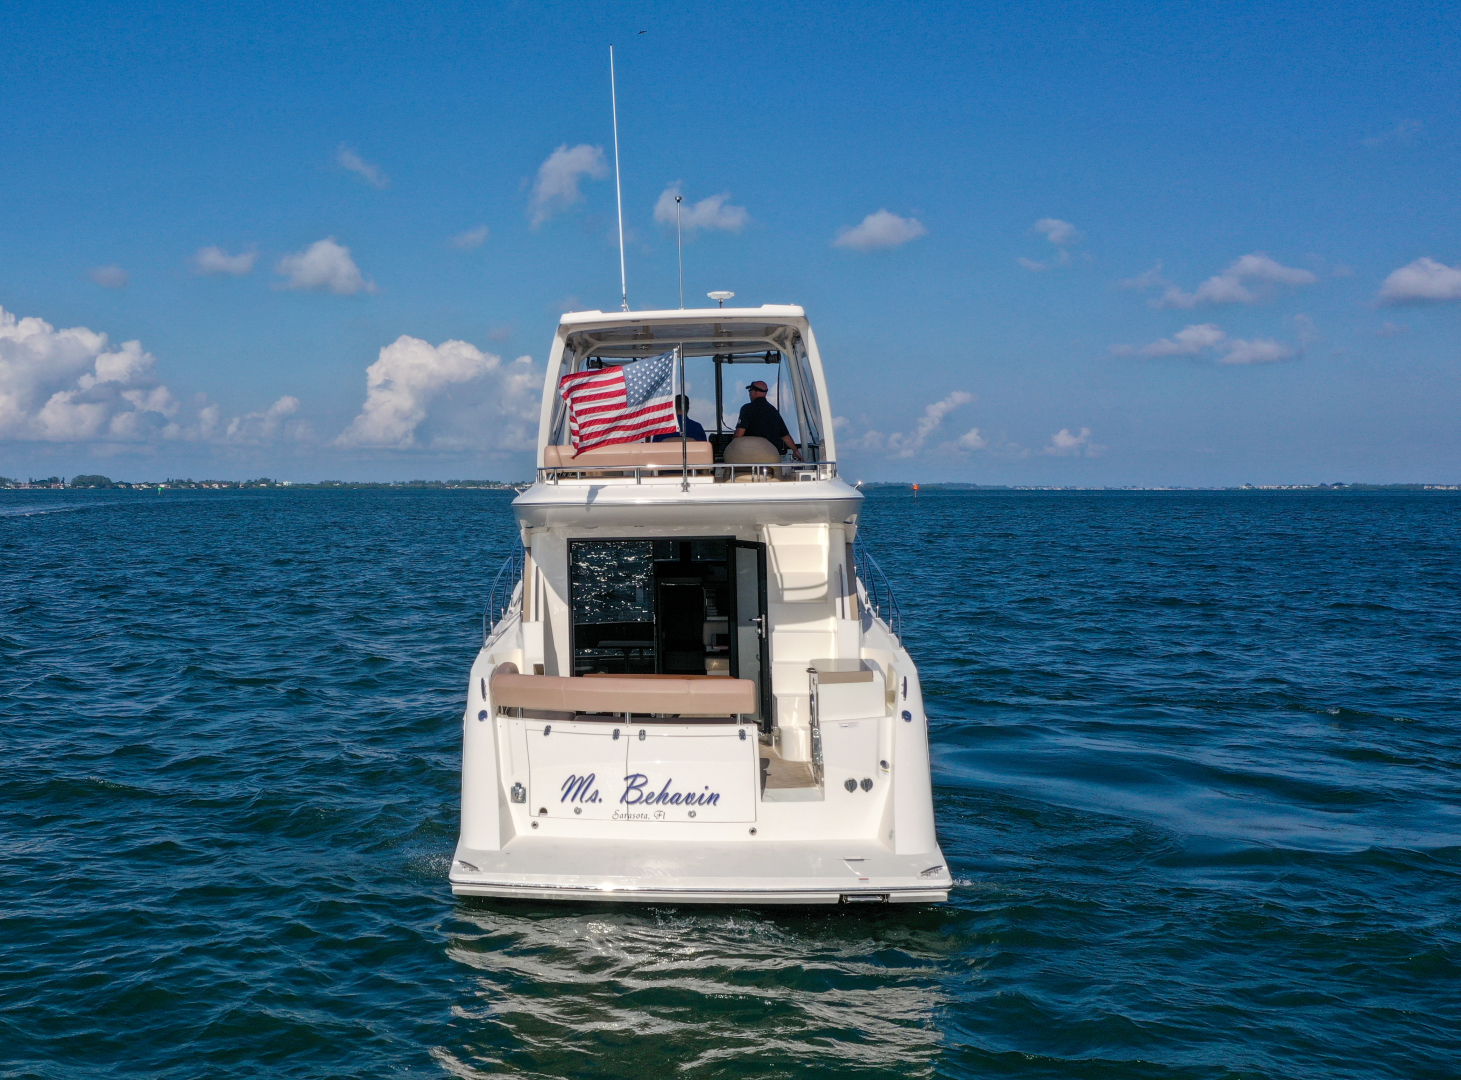 Carver-C40 2016-Ms. Behavin Longboat Key-Florida-United States-2016 40 Carver C Motor Yacht  Ms. Behavin  Profile-1515697   Thumbnail